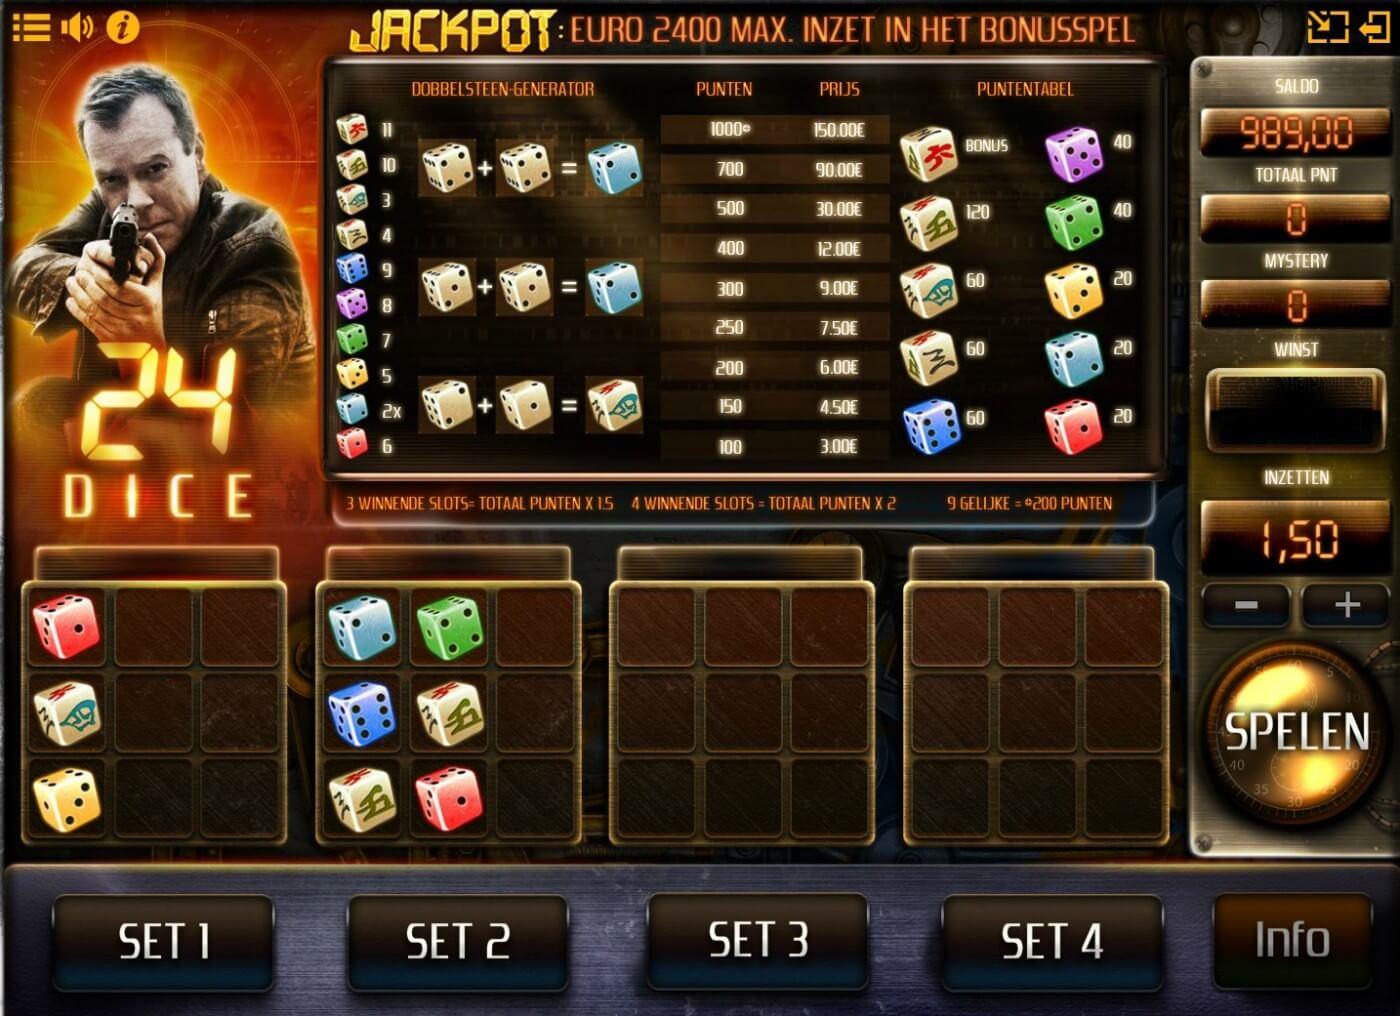 24 iSoftBet Bonusgame